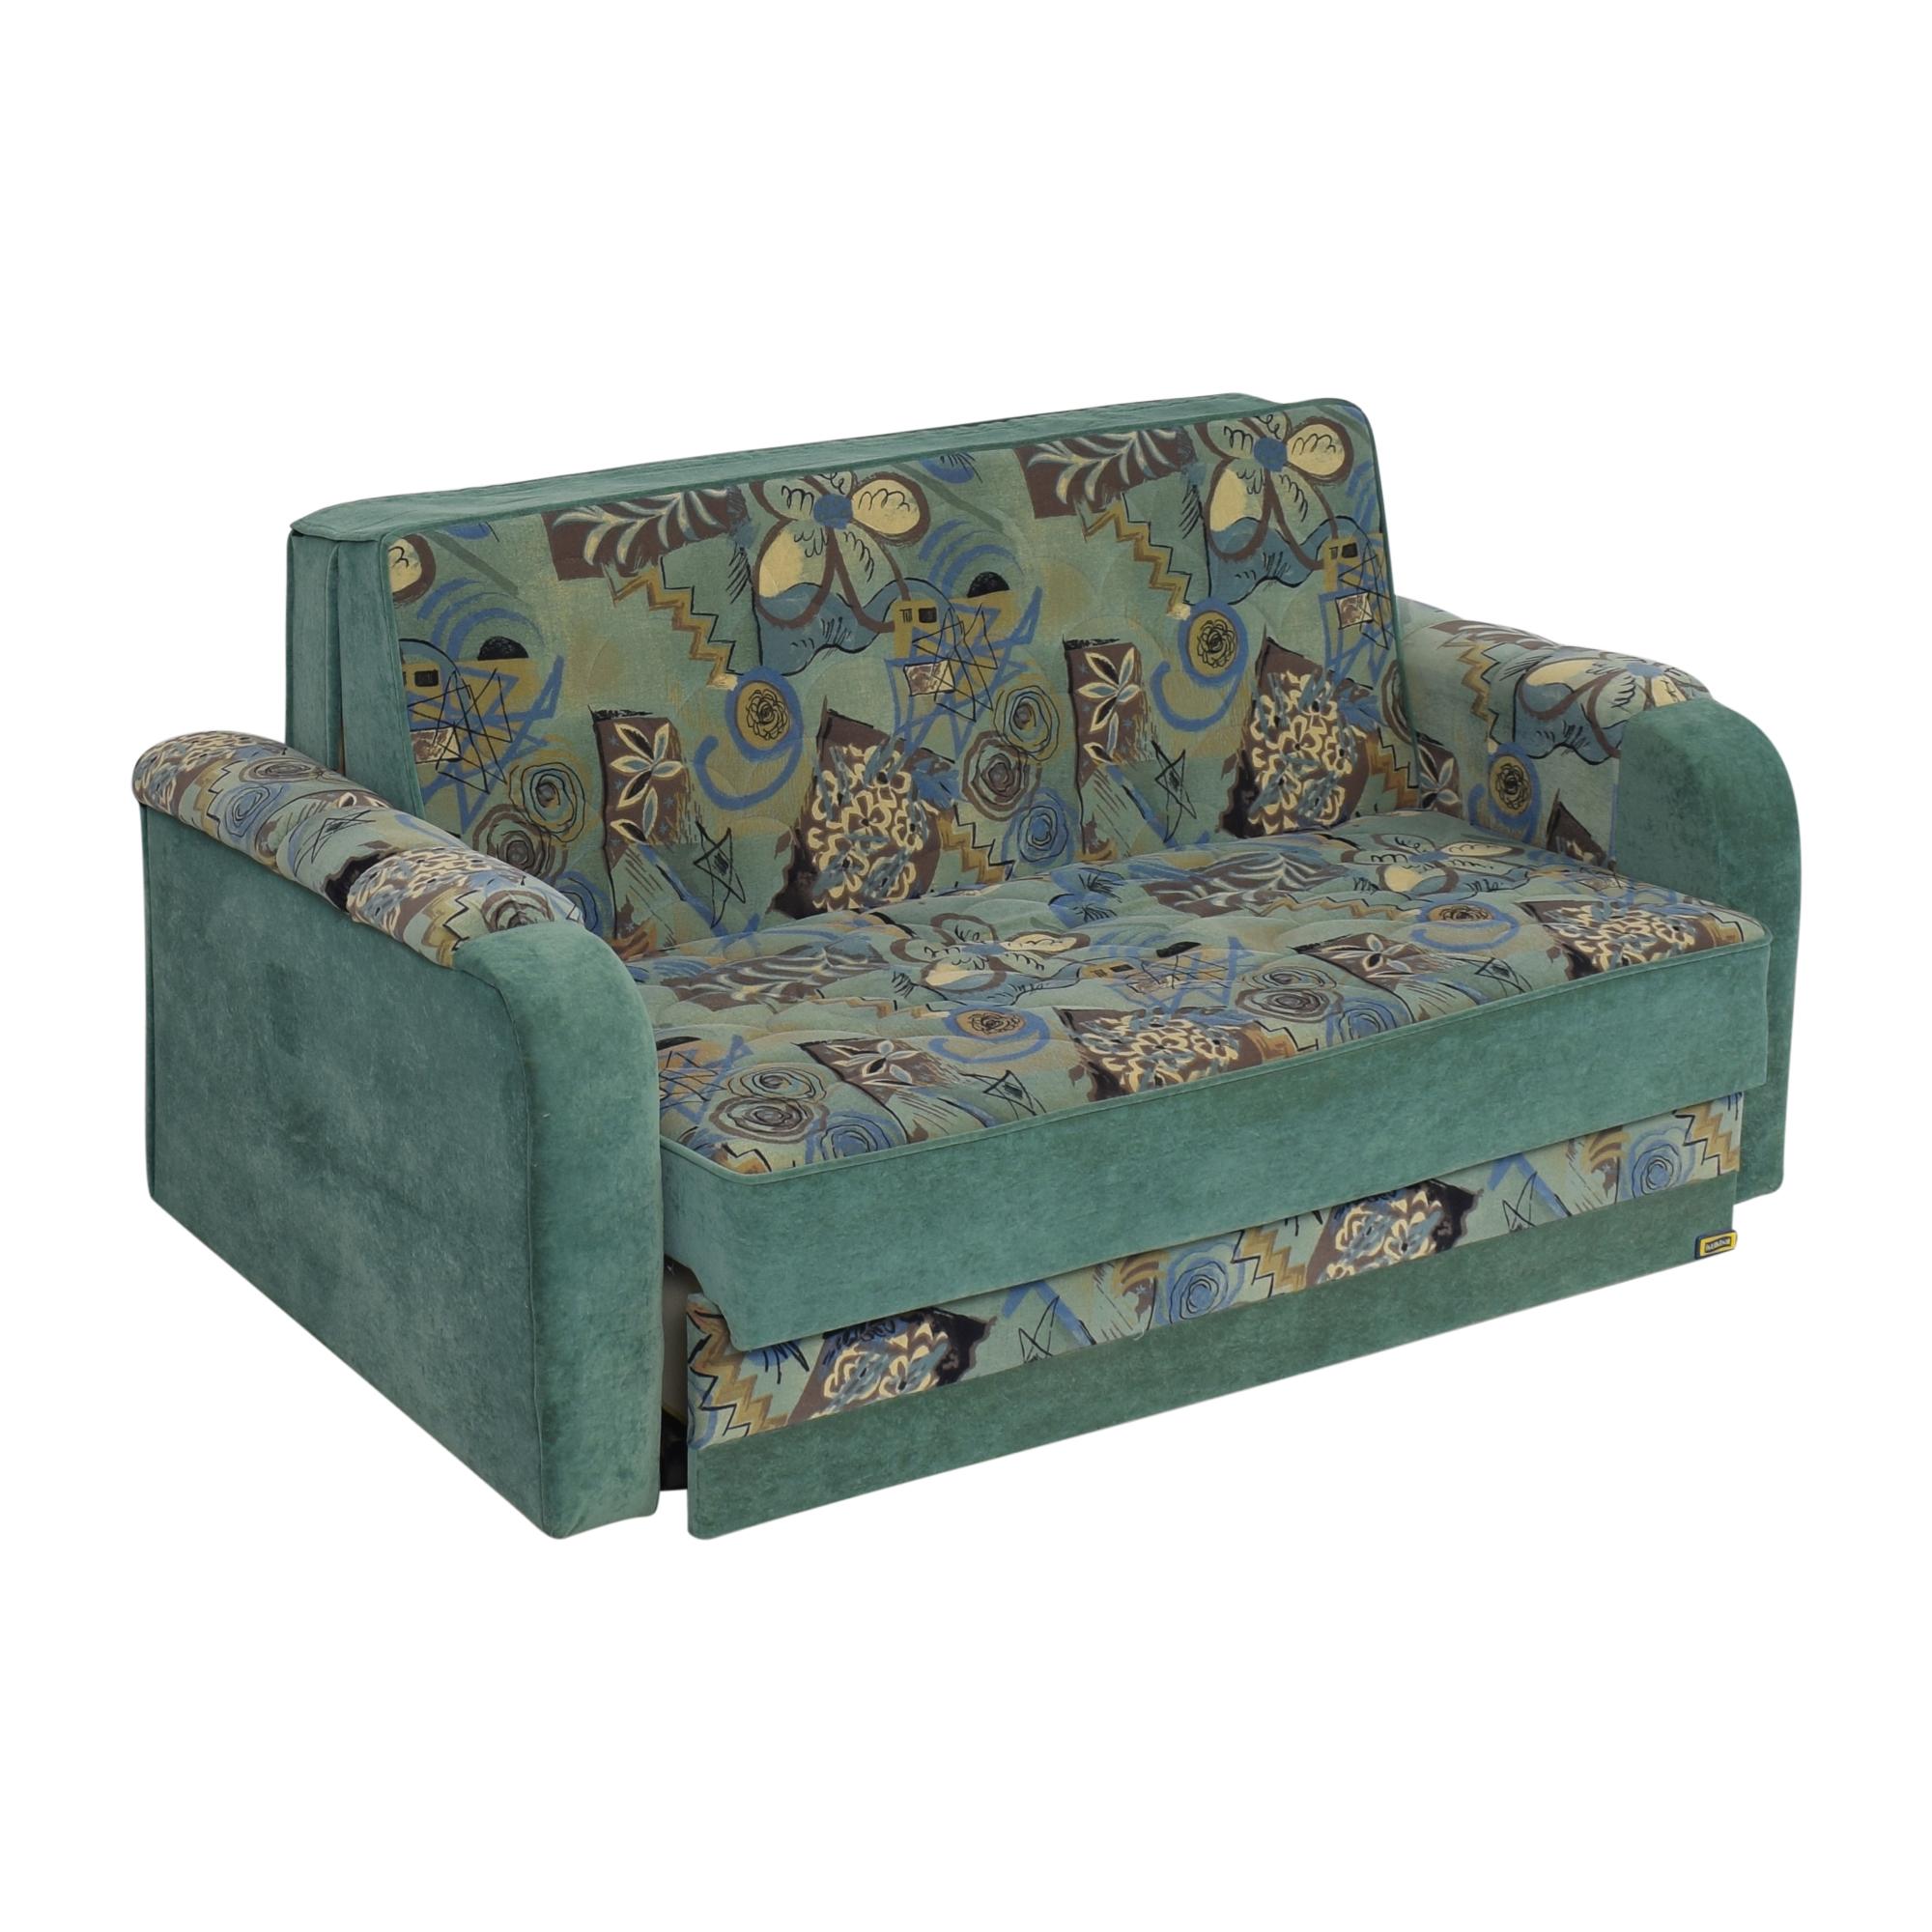 Istikbal Istikbal Vintage Daybed Sofa pa